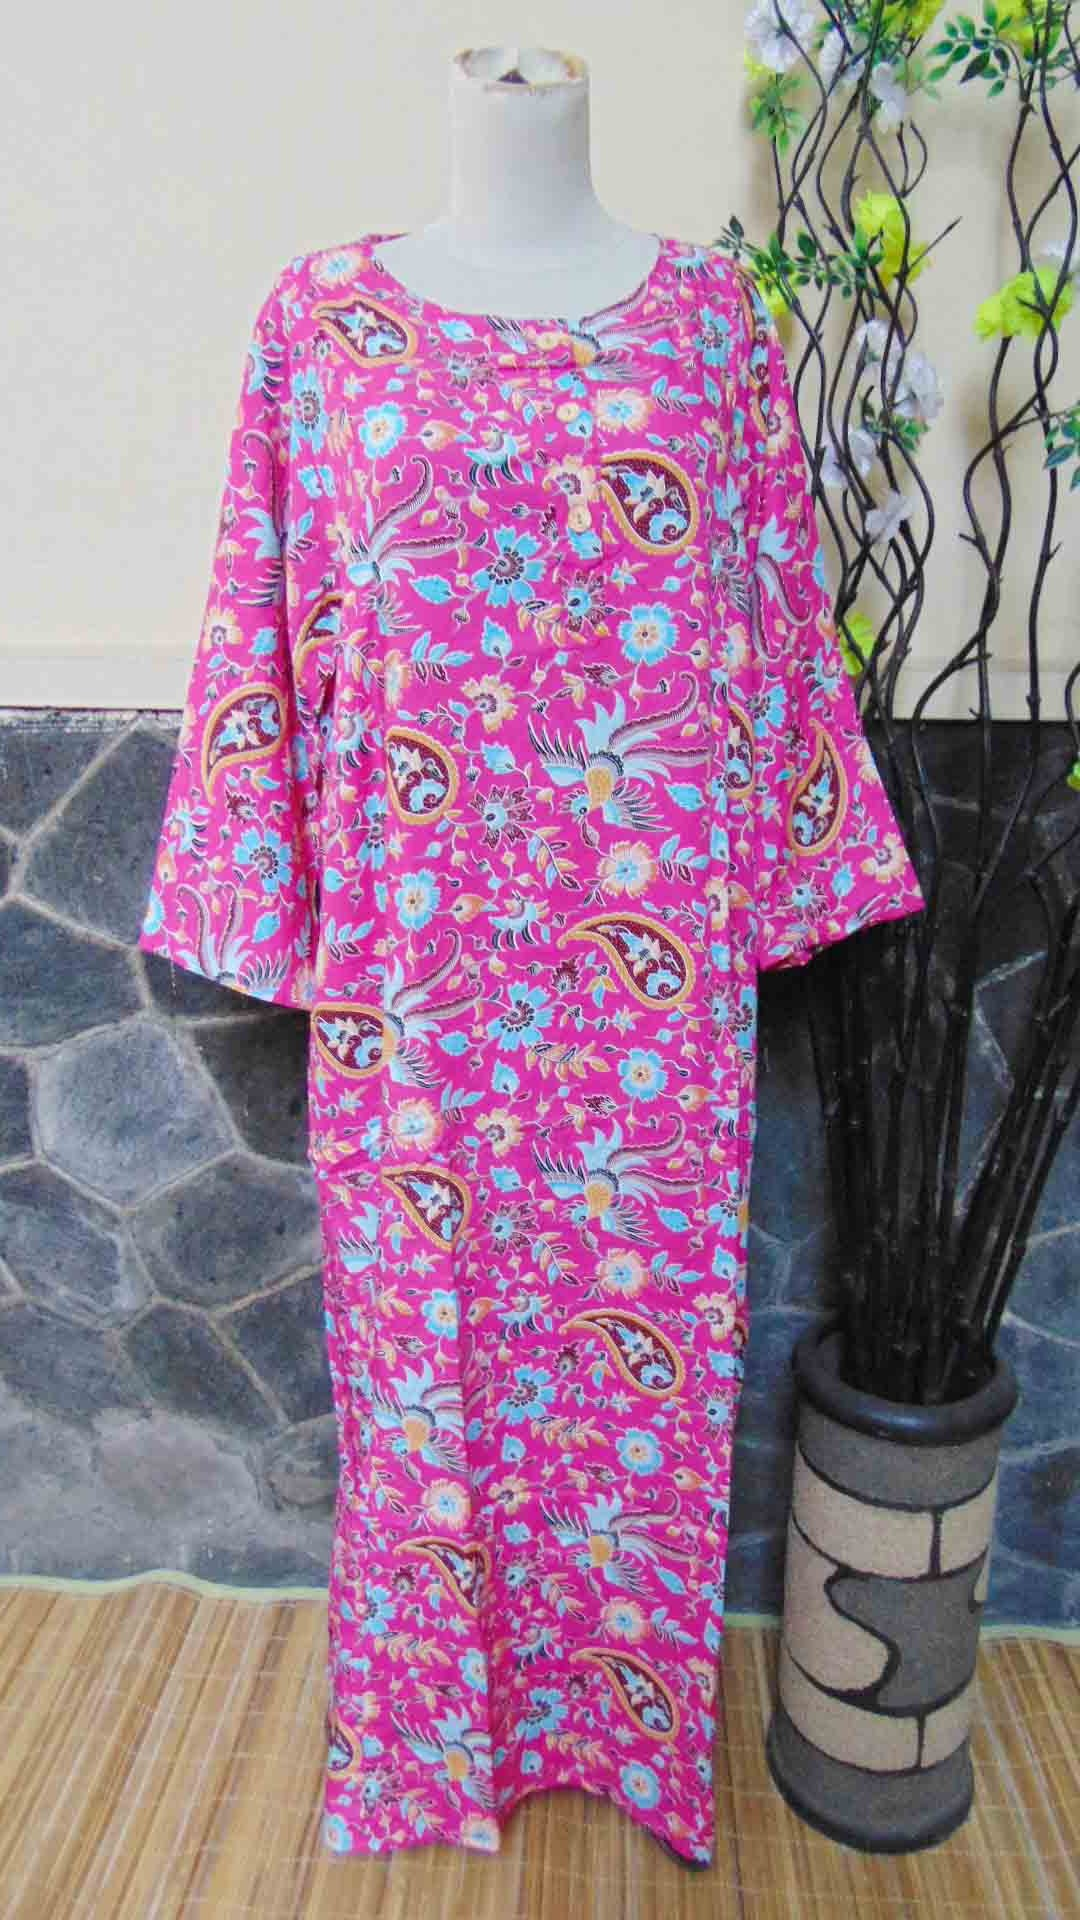 baju tidur santai batik longdress jumbo pias cantik daster lengan panjang wanita longdres baladewa motif pink cantik